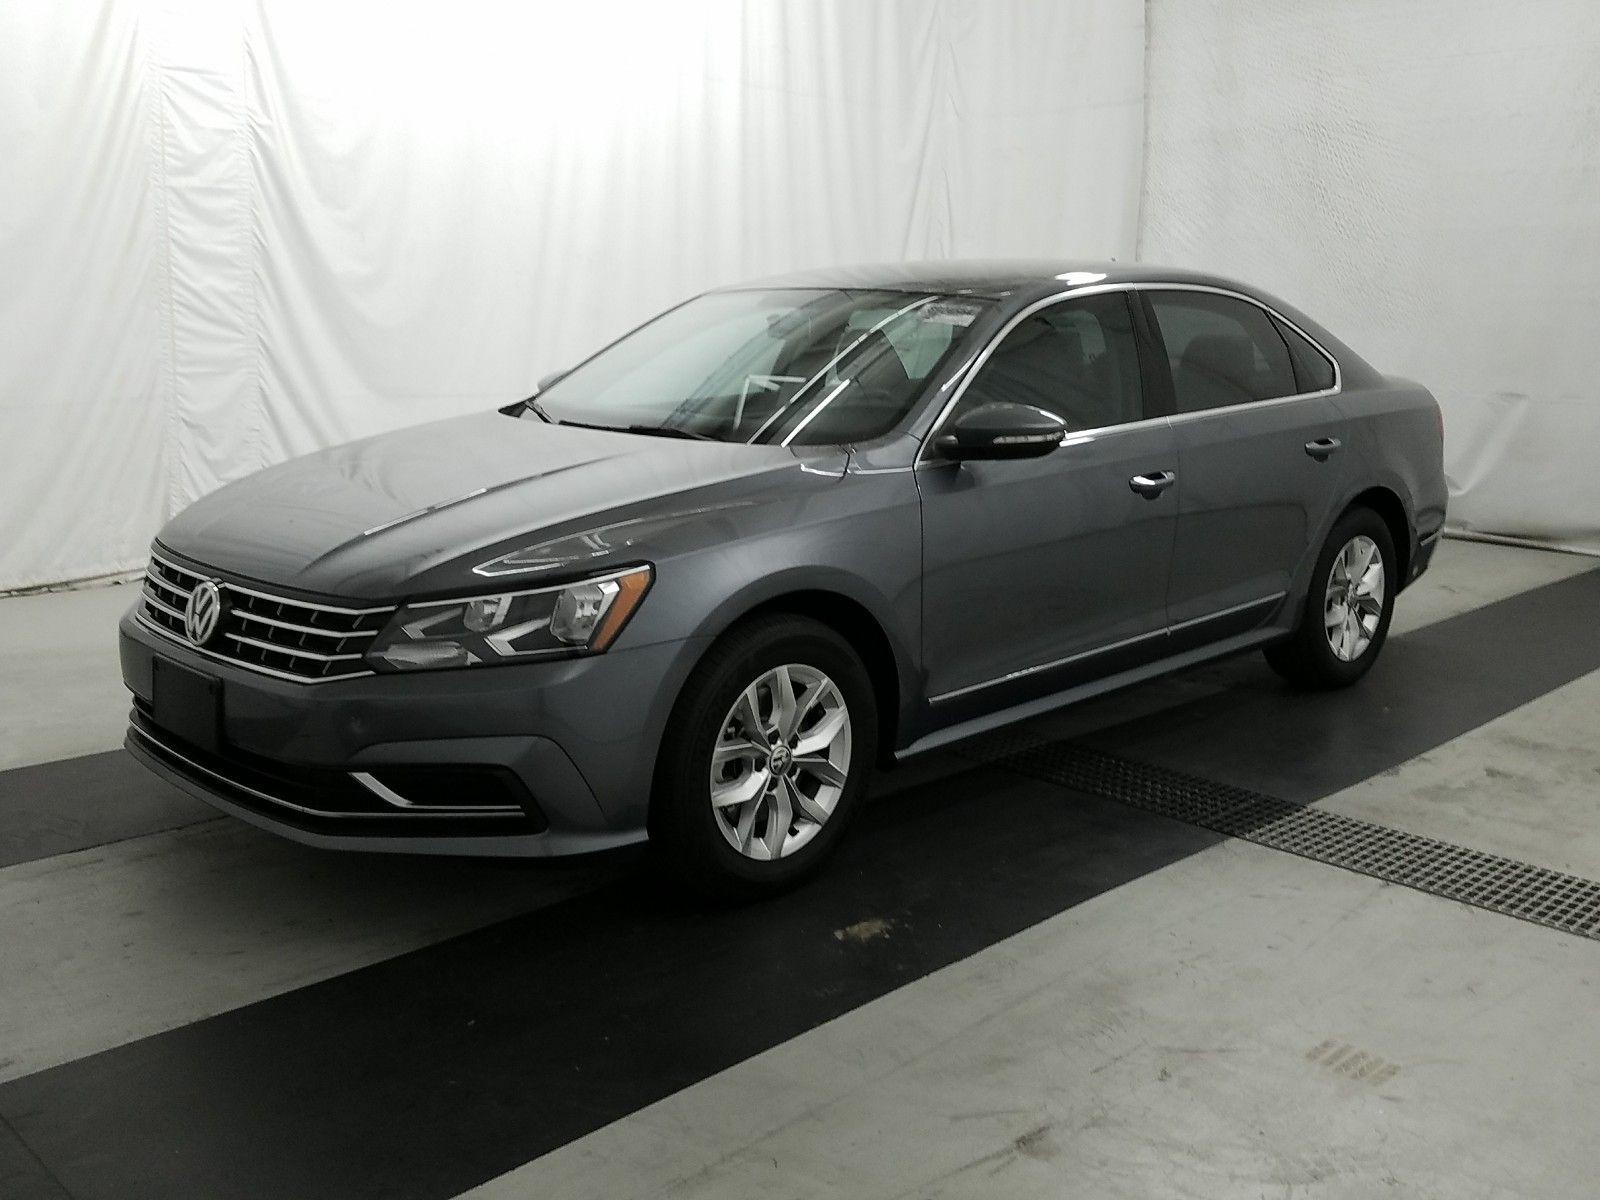 2017 Volkswagen Passat 1.8. Lot 99913355439 Vin 1VWAT7A37HC068333